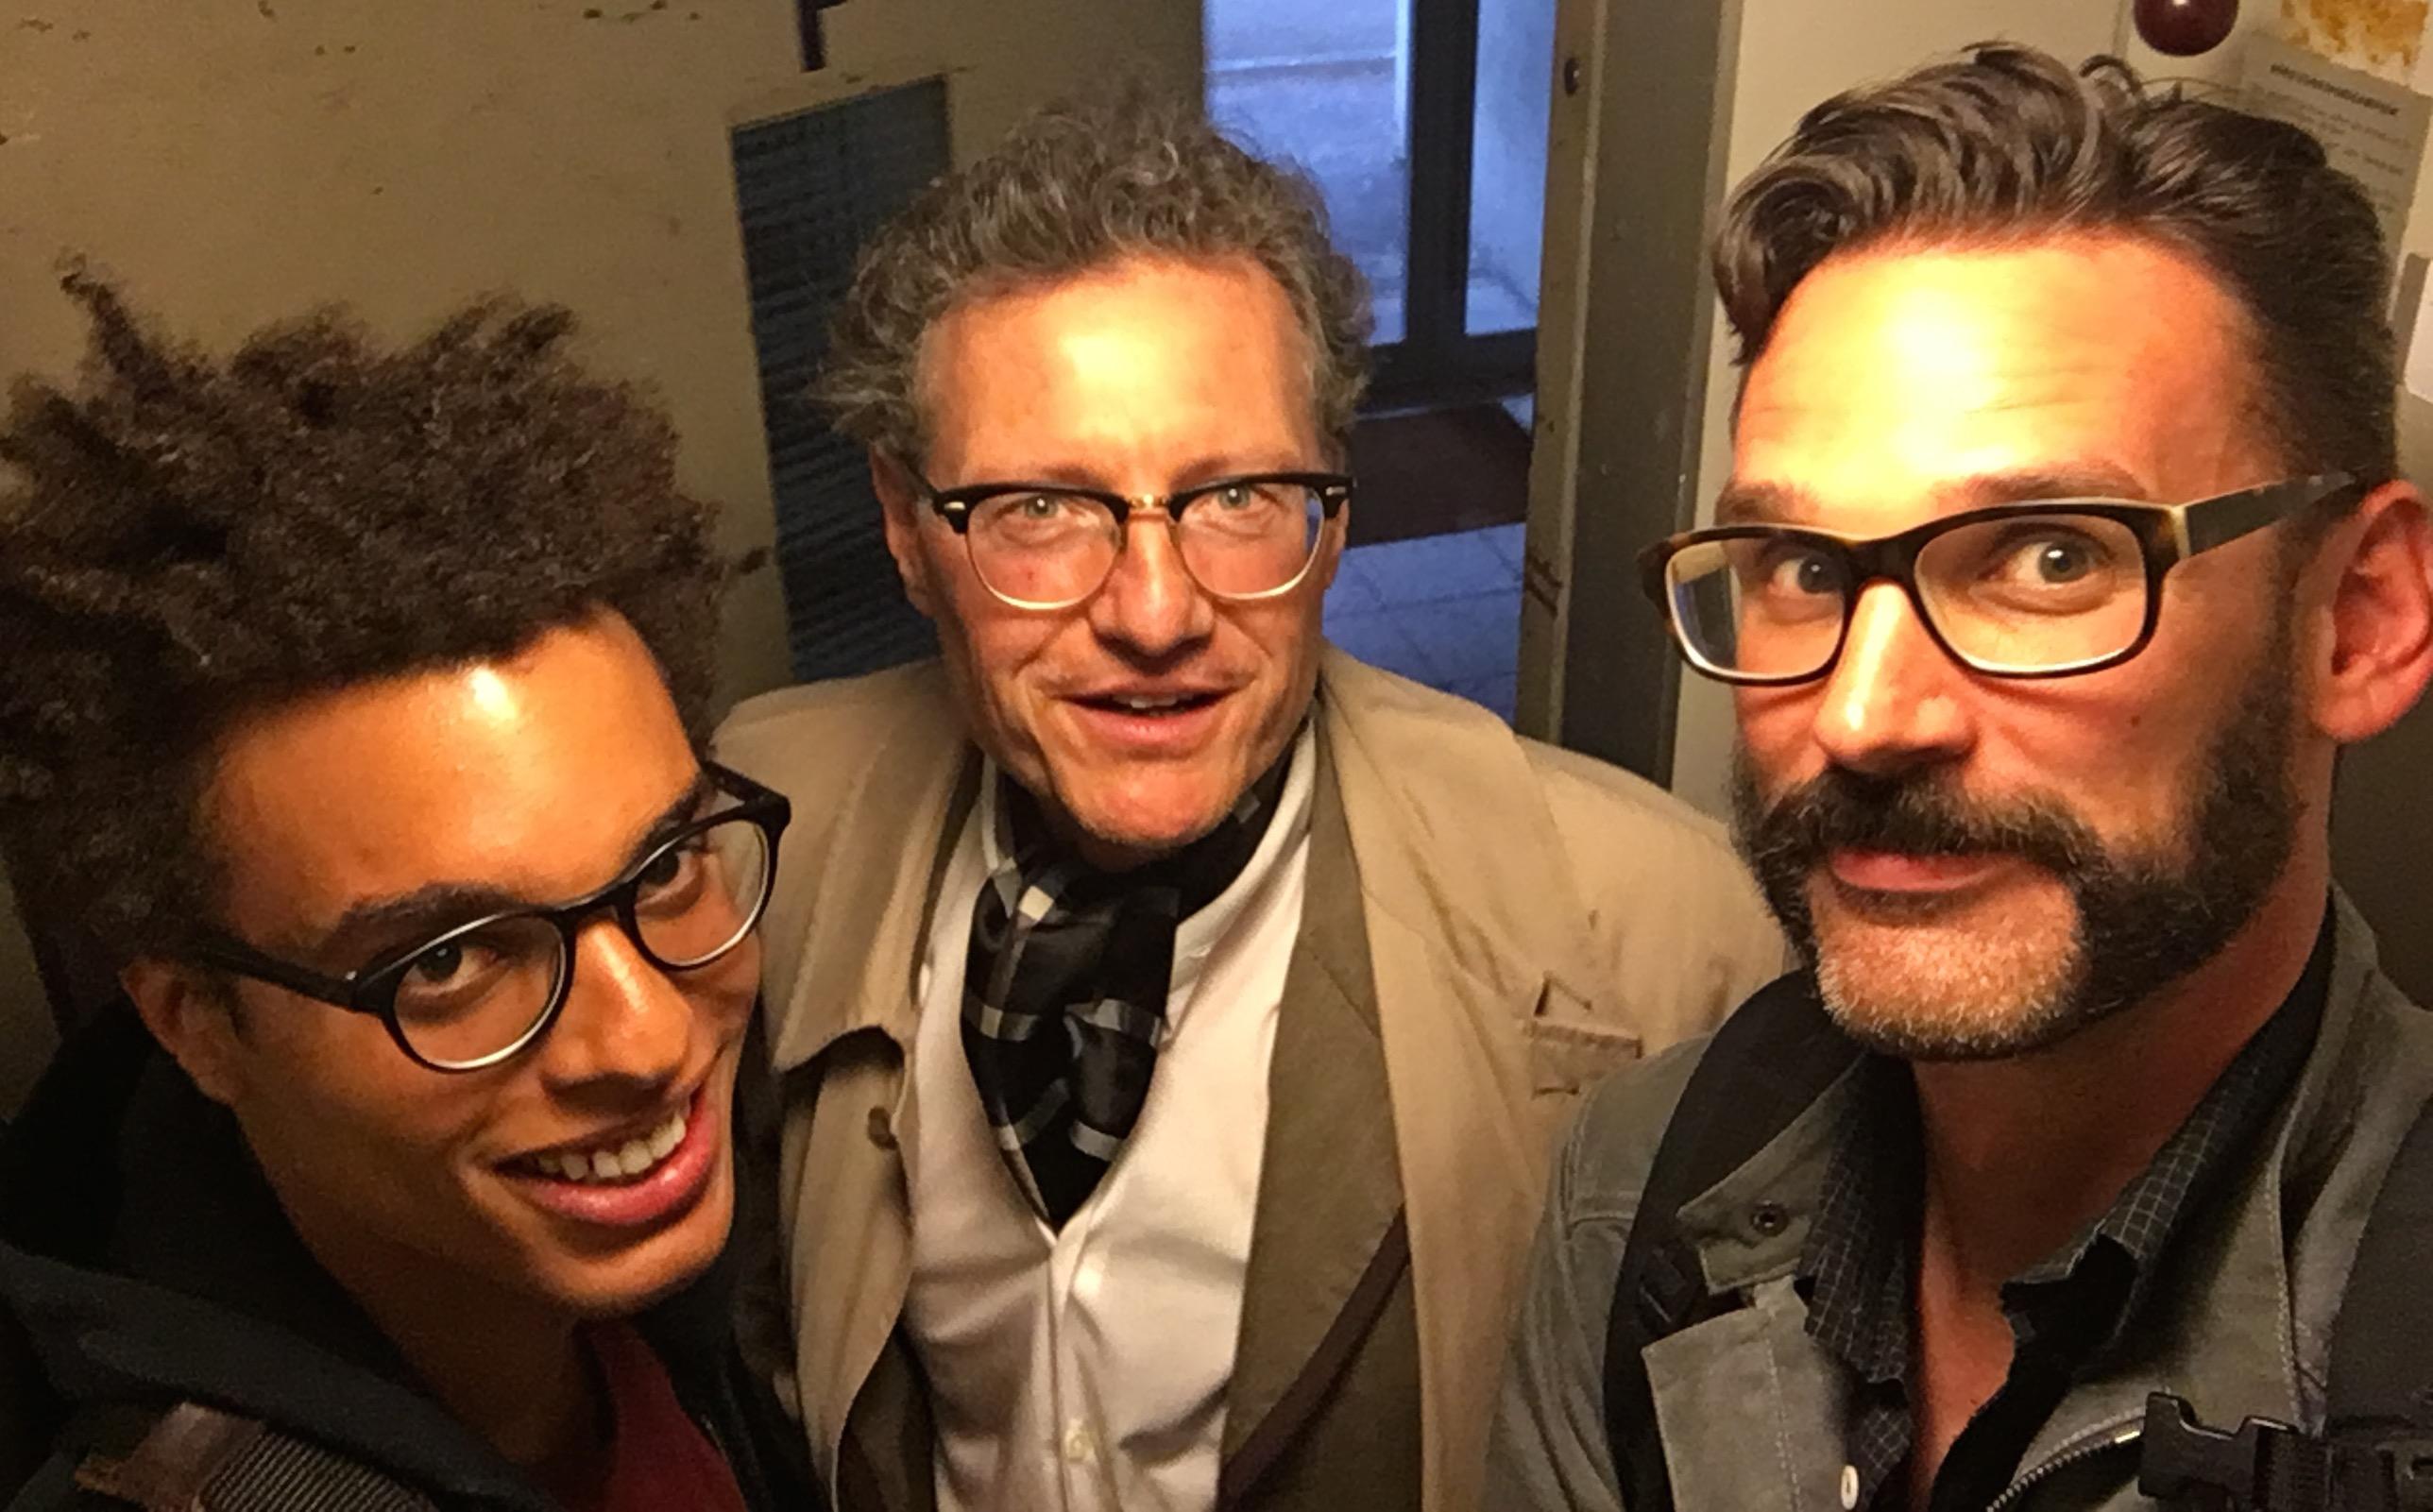 Tapiwa Svovse, Dieter Ulrich, Christian Weber